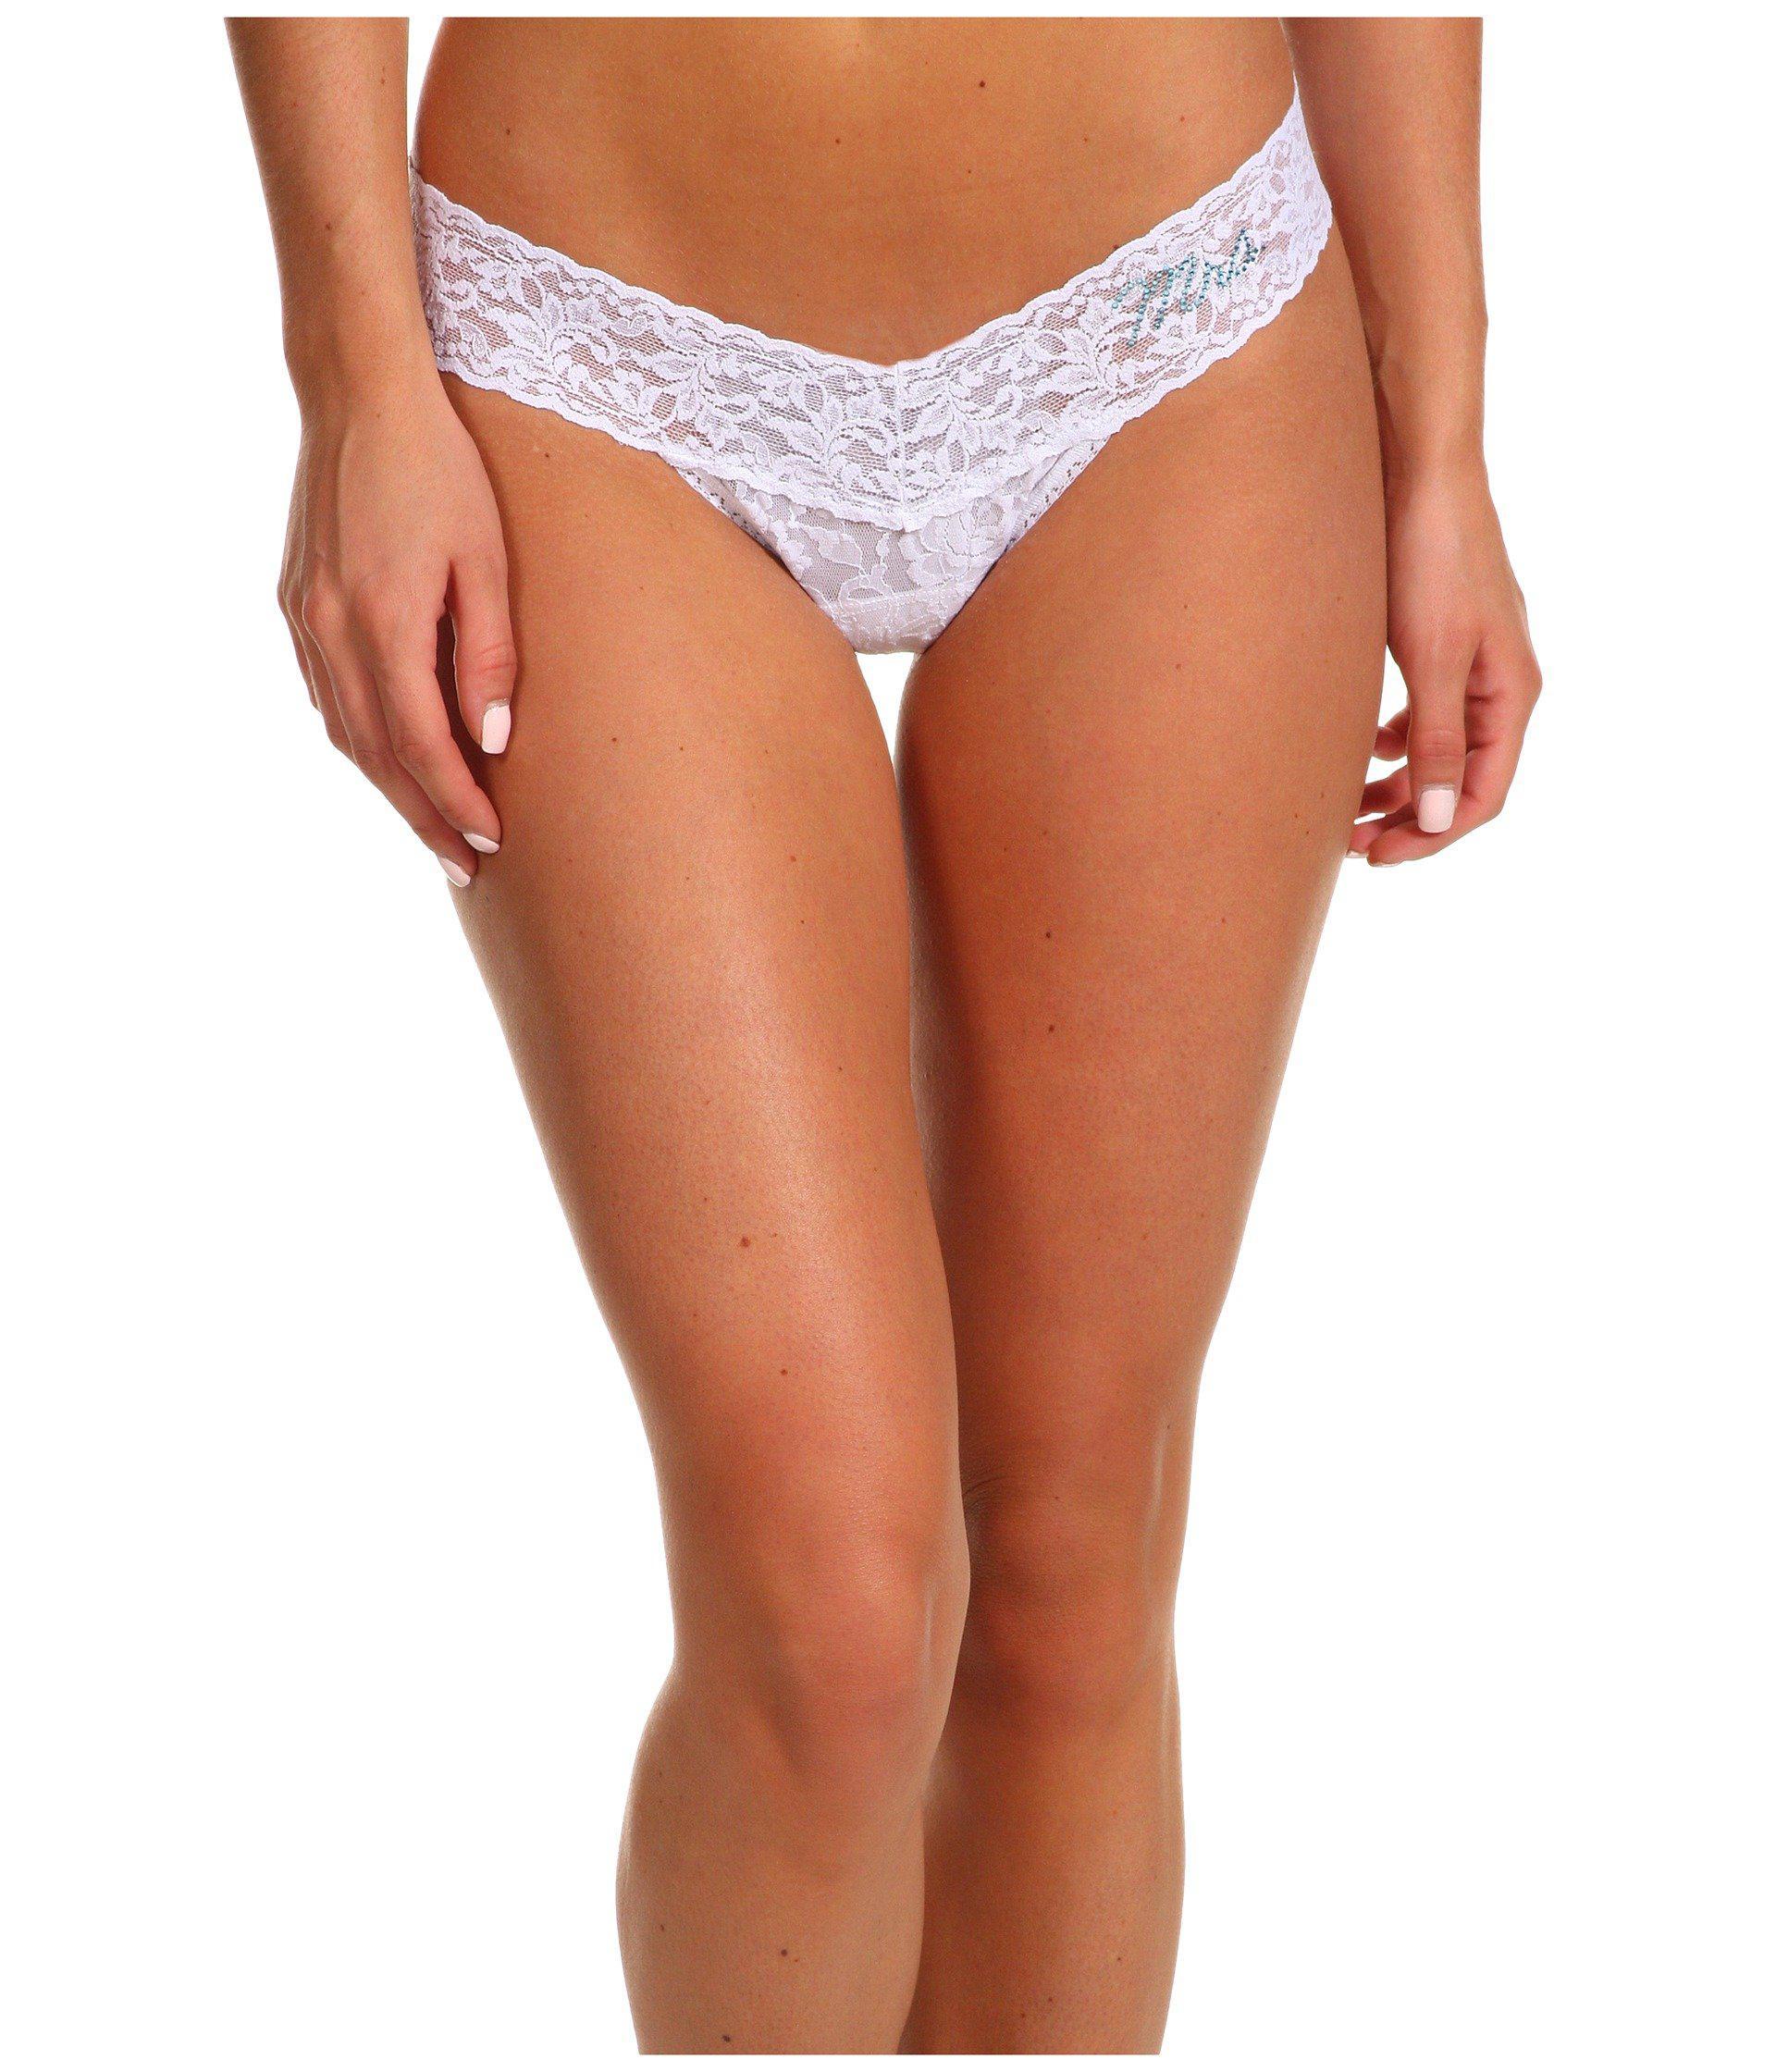 e514da782c83 Lyst - Hanky Panky Bride Mrs. Low Rise Thong Gift Set (white/powder Blue)  Women's Underwear